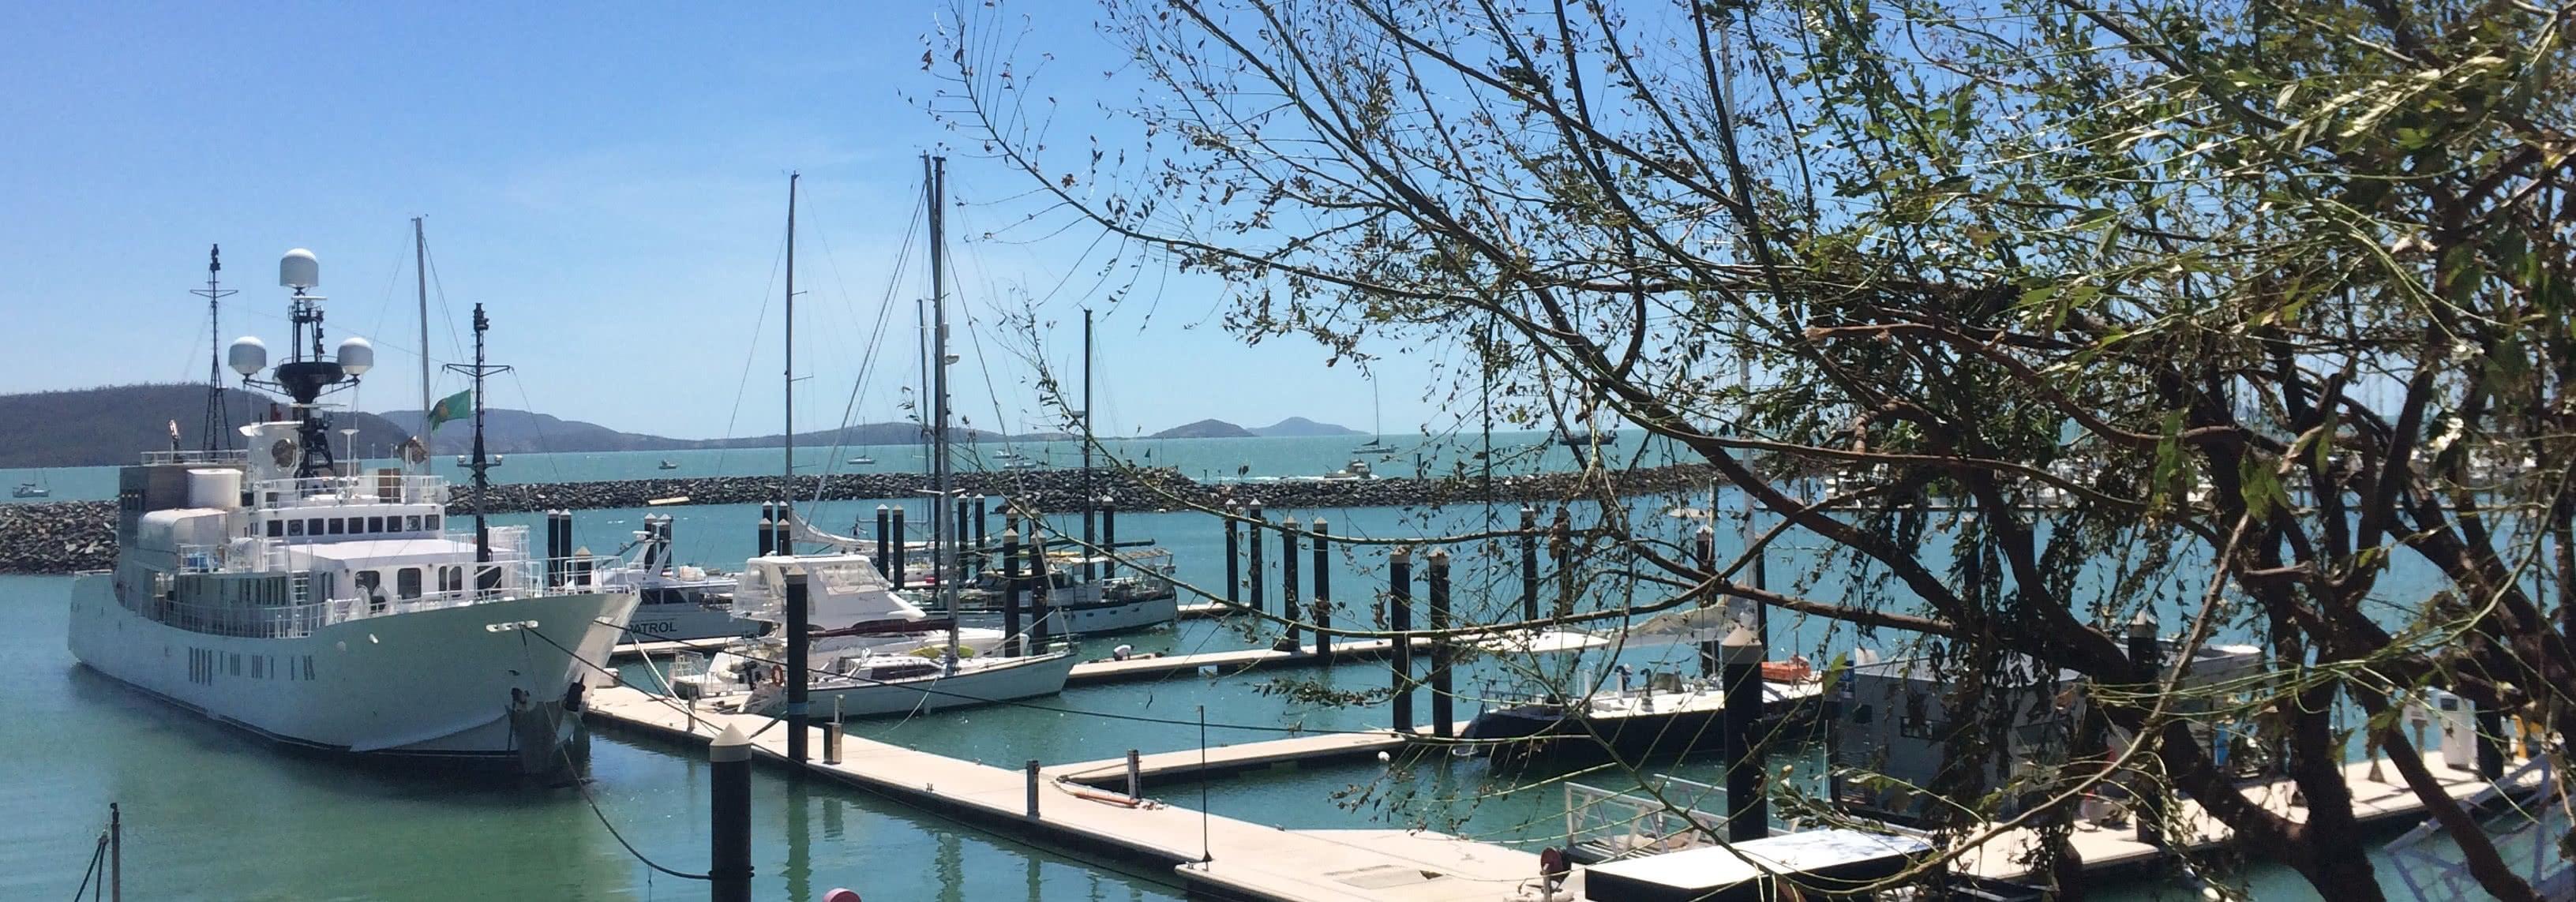 Marina recovery update 07.04.2017